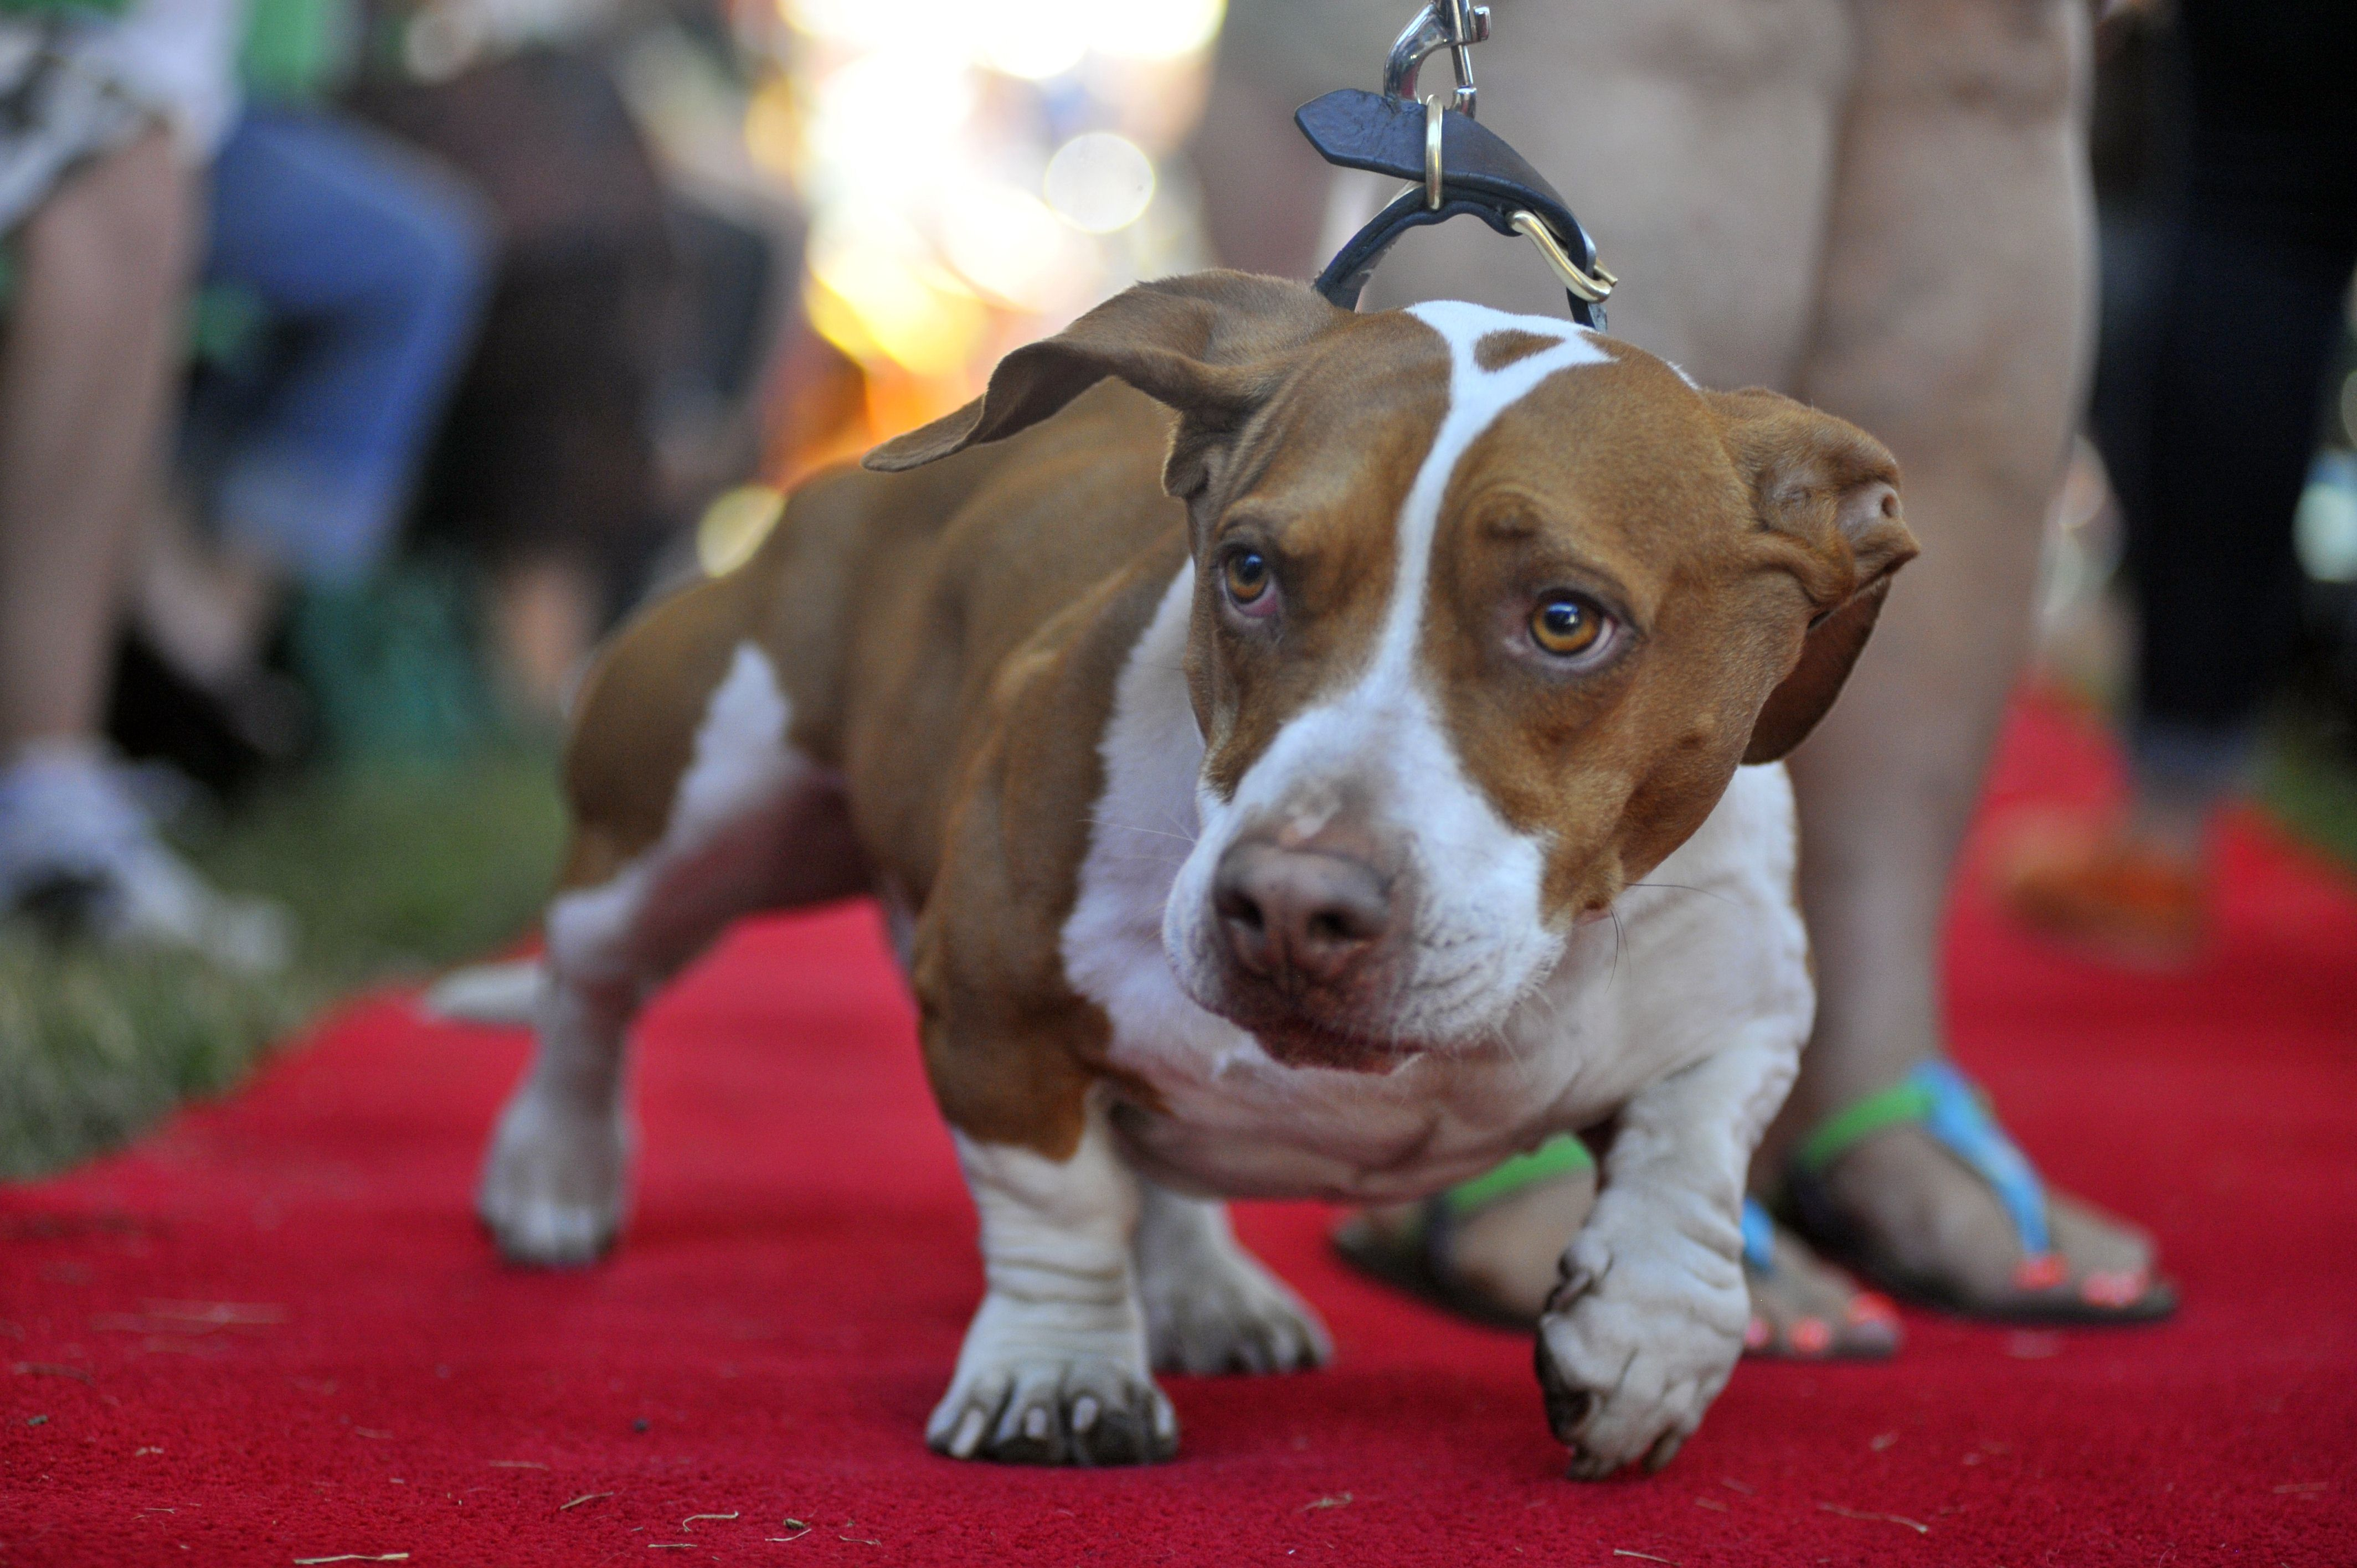 Gallery: Odd-looking mutt Walle wins world's ugliest dog contest